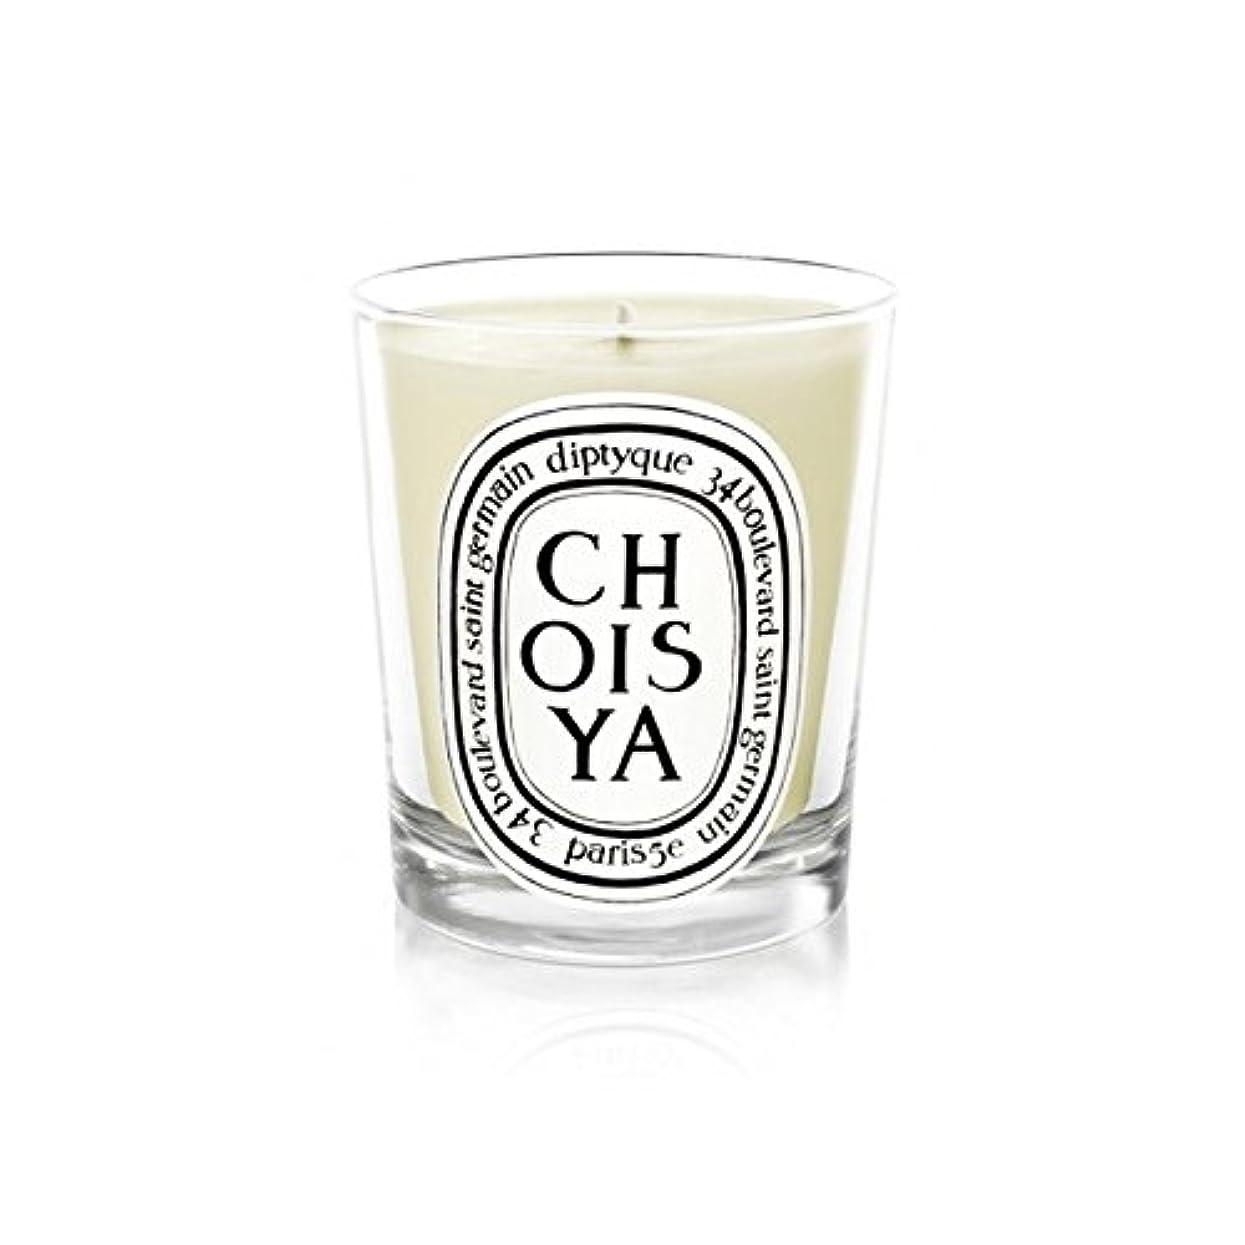 Diptyque Candle Choisya / Mexican Orange Blossom 190g (Pack of 2) - DiptyqueキャンドルChoisya /メキシコオレンジの花の190グラム (x2...